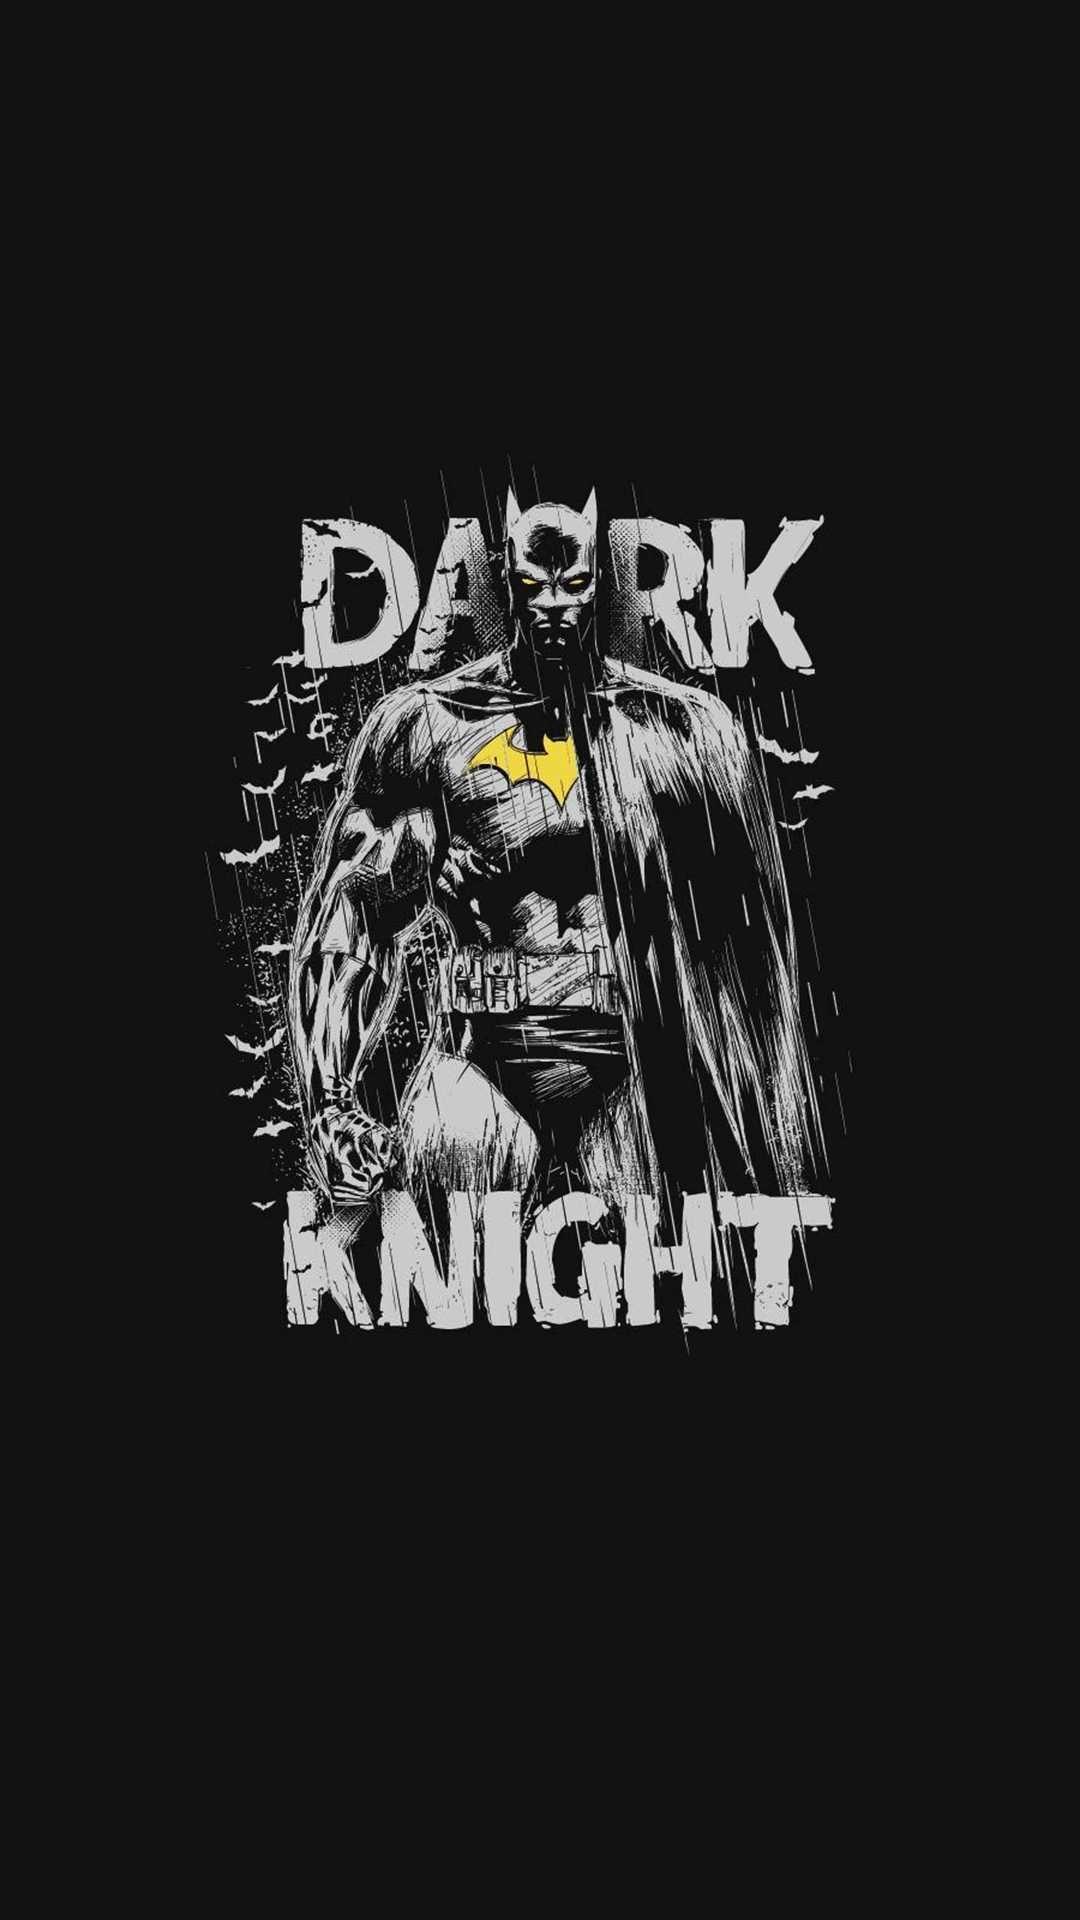 The Batman Minimal Dark Knight Wallpaper Dark Knight Wallpaper Badass Wallpaper Iphone Batman Wallpaper